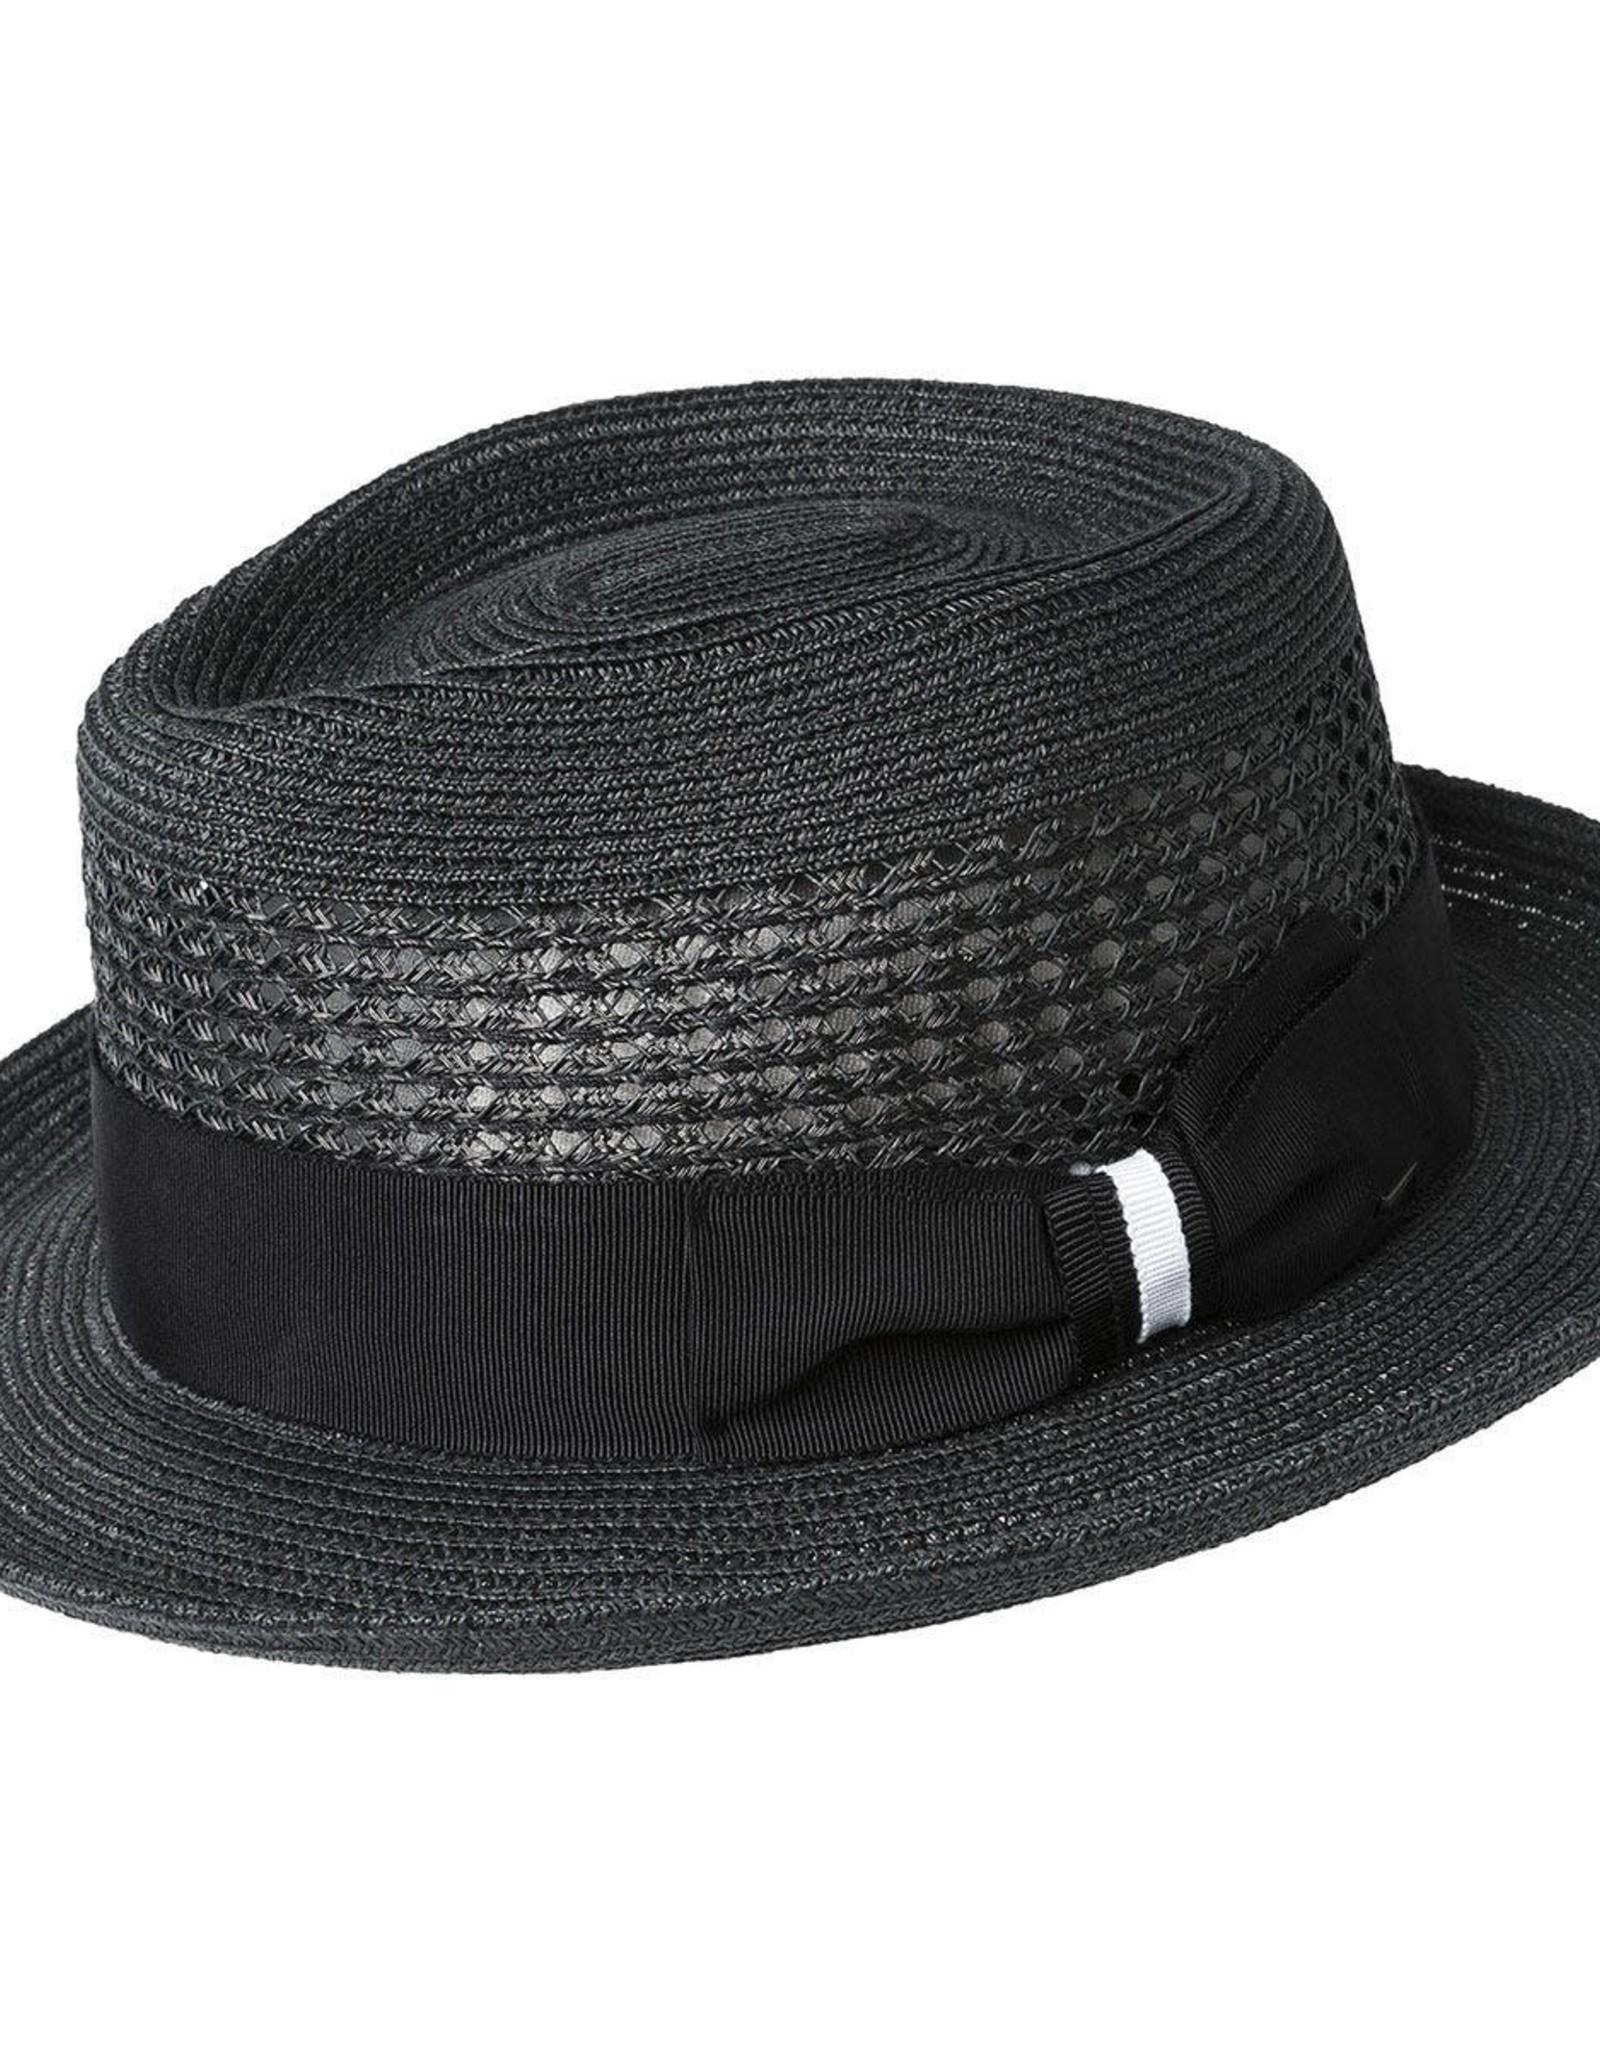 Bailey Hat Co. HAT-FEDORA-WILSHIRE, STRAW-BRAID